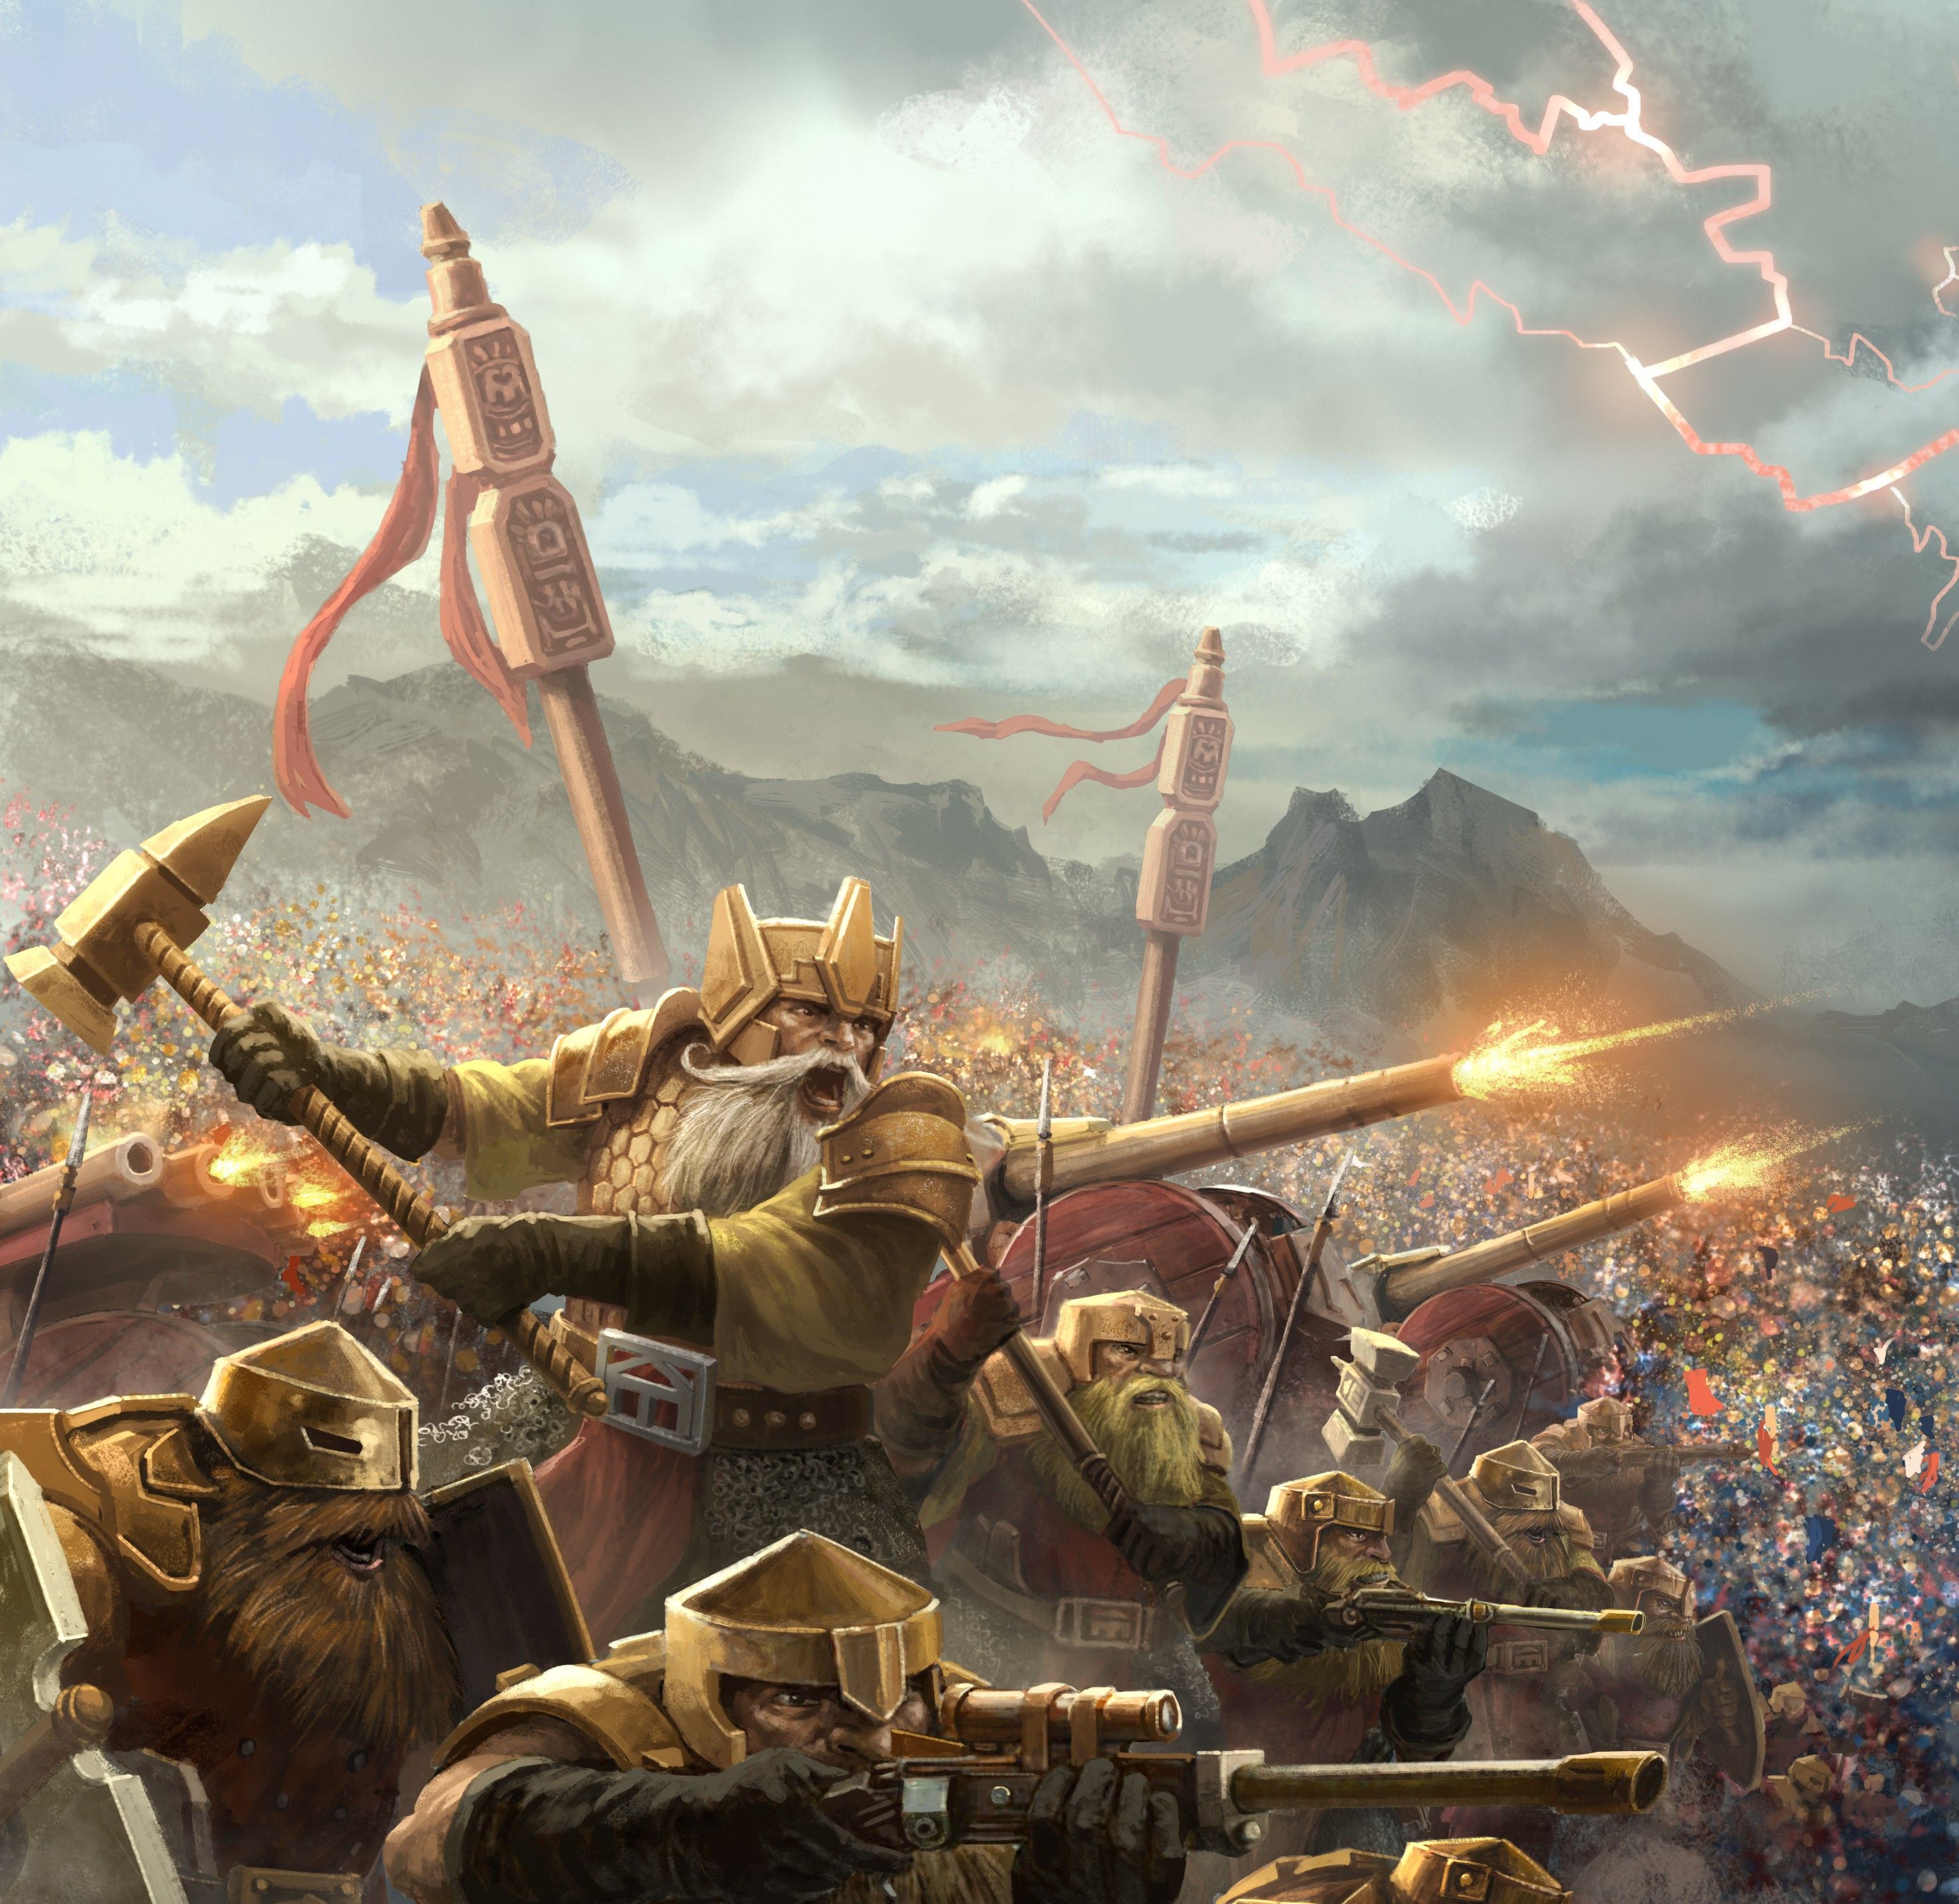 Dwarfs only do serious warfare!